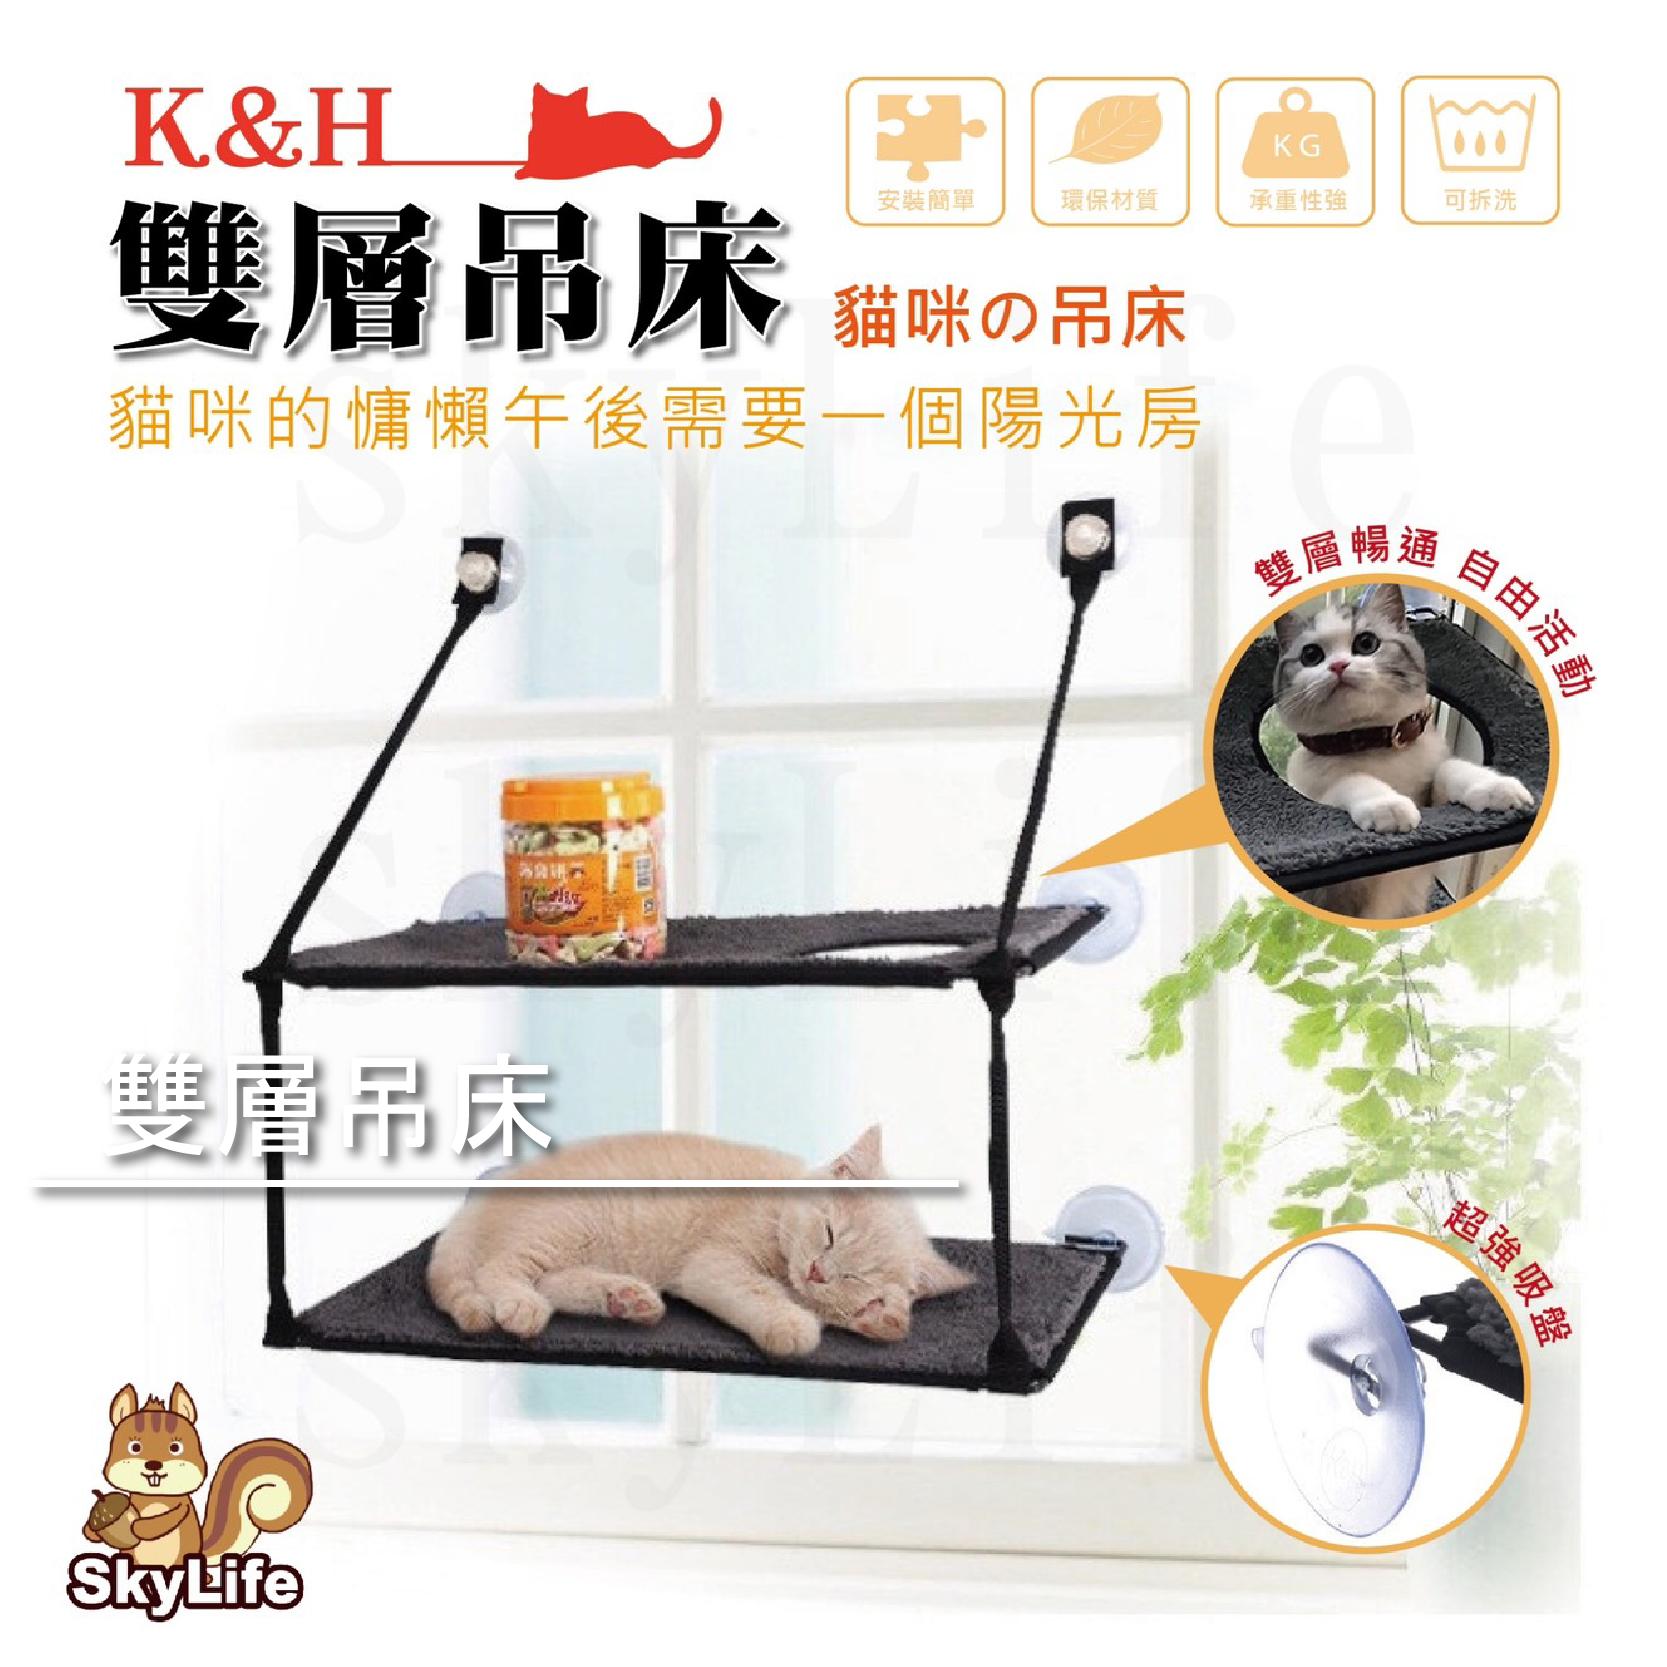 【SkyLife寵物用品】K&H雙層吊床